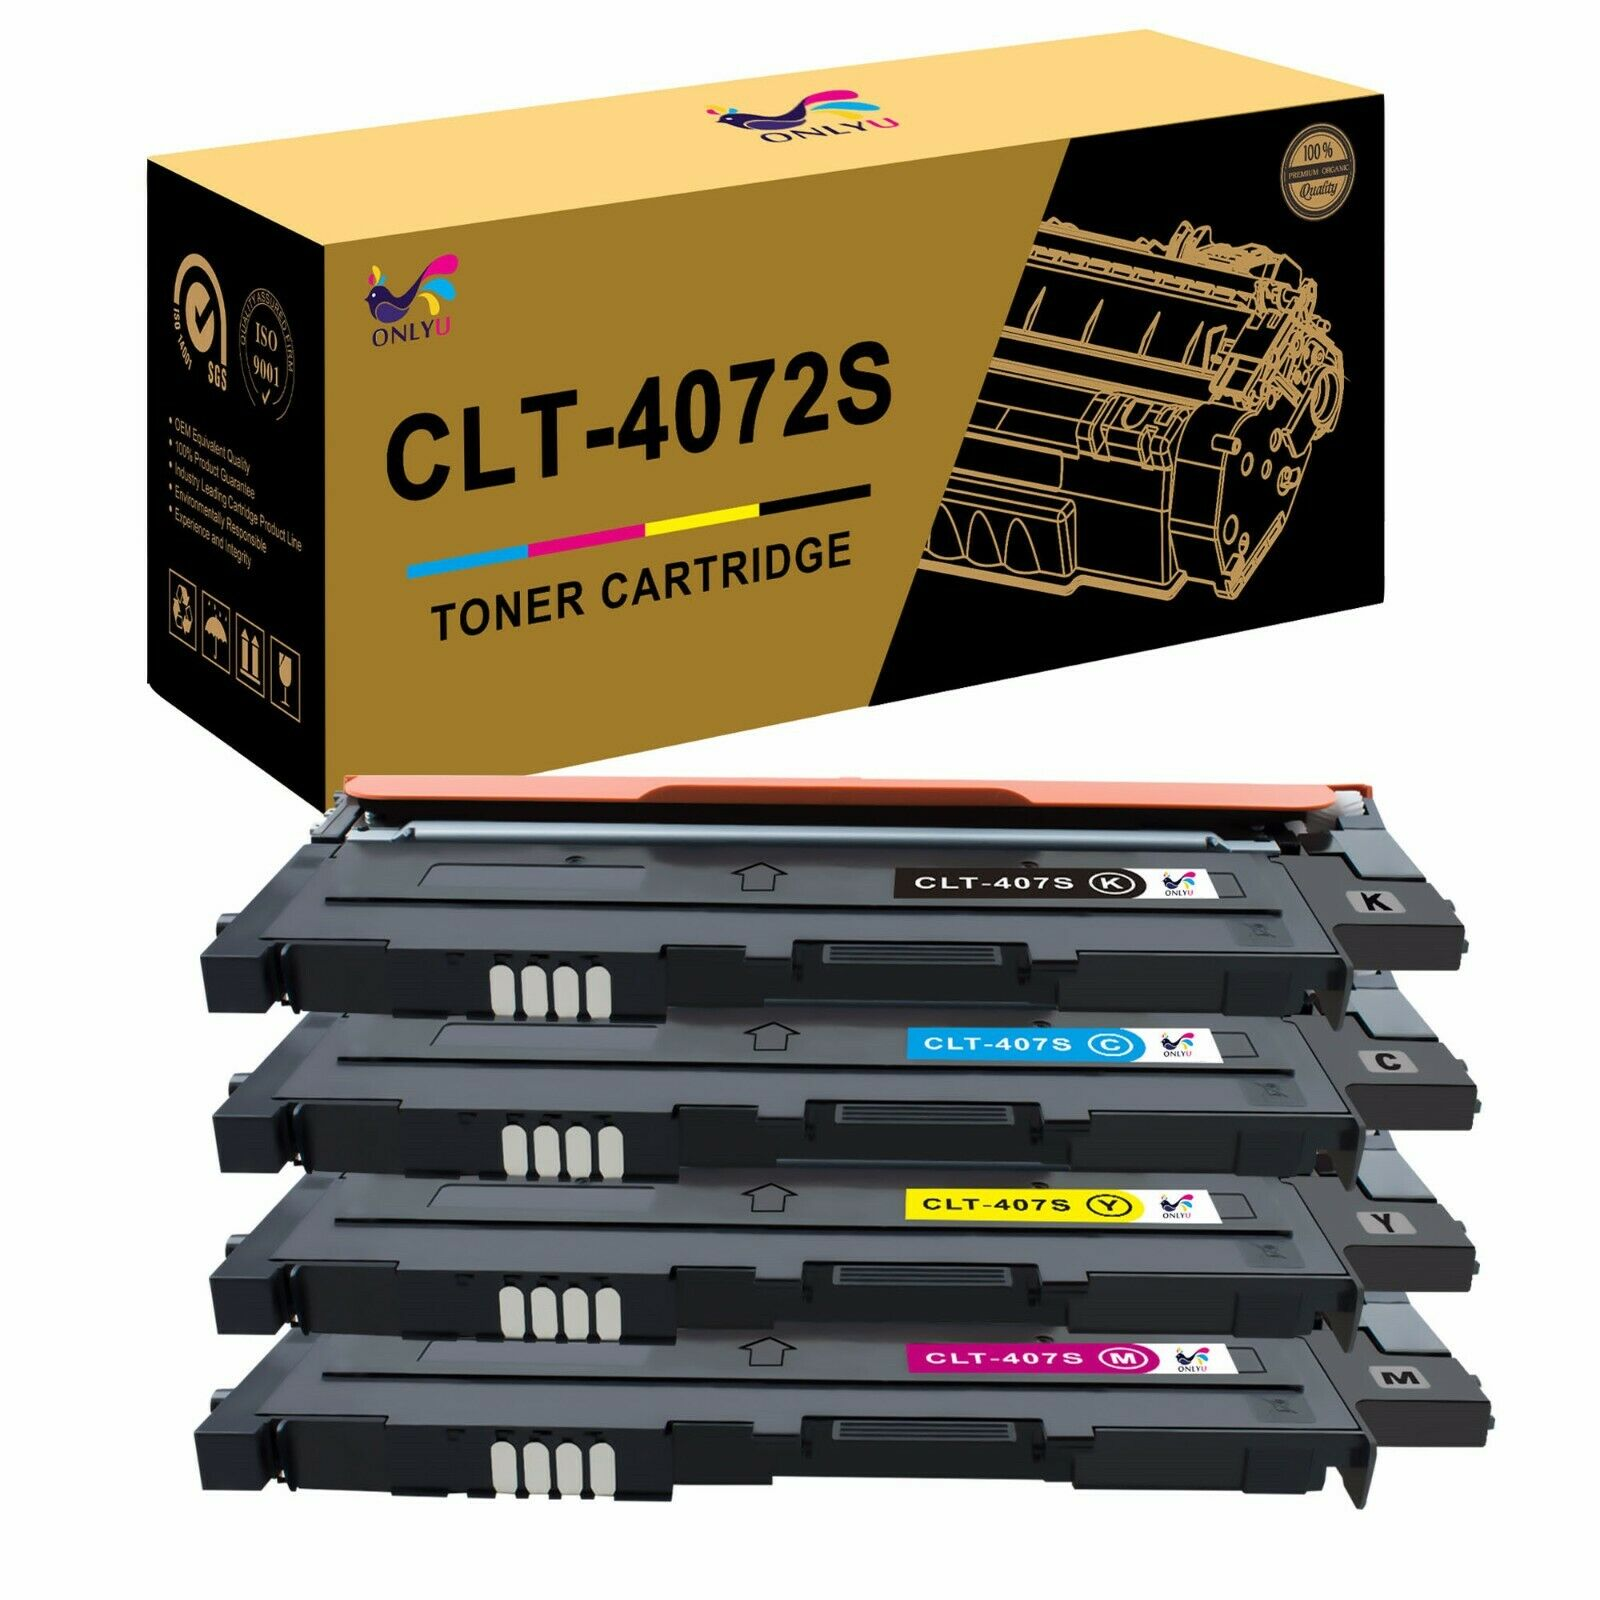 Set 4 Toner XXL für Samsung CLP-325 CLX-3185 FN CLX-3185 FW CLP-320 CLT4072 KCMY